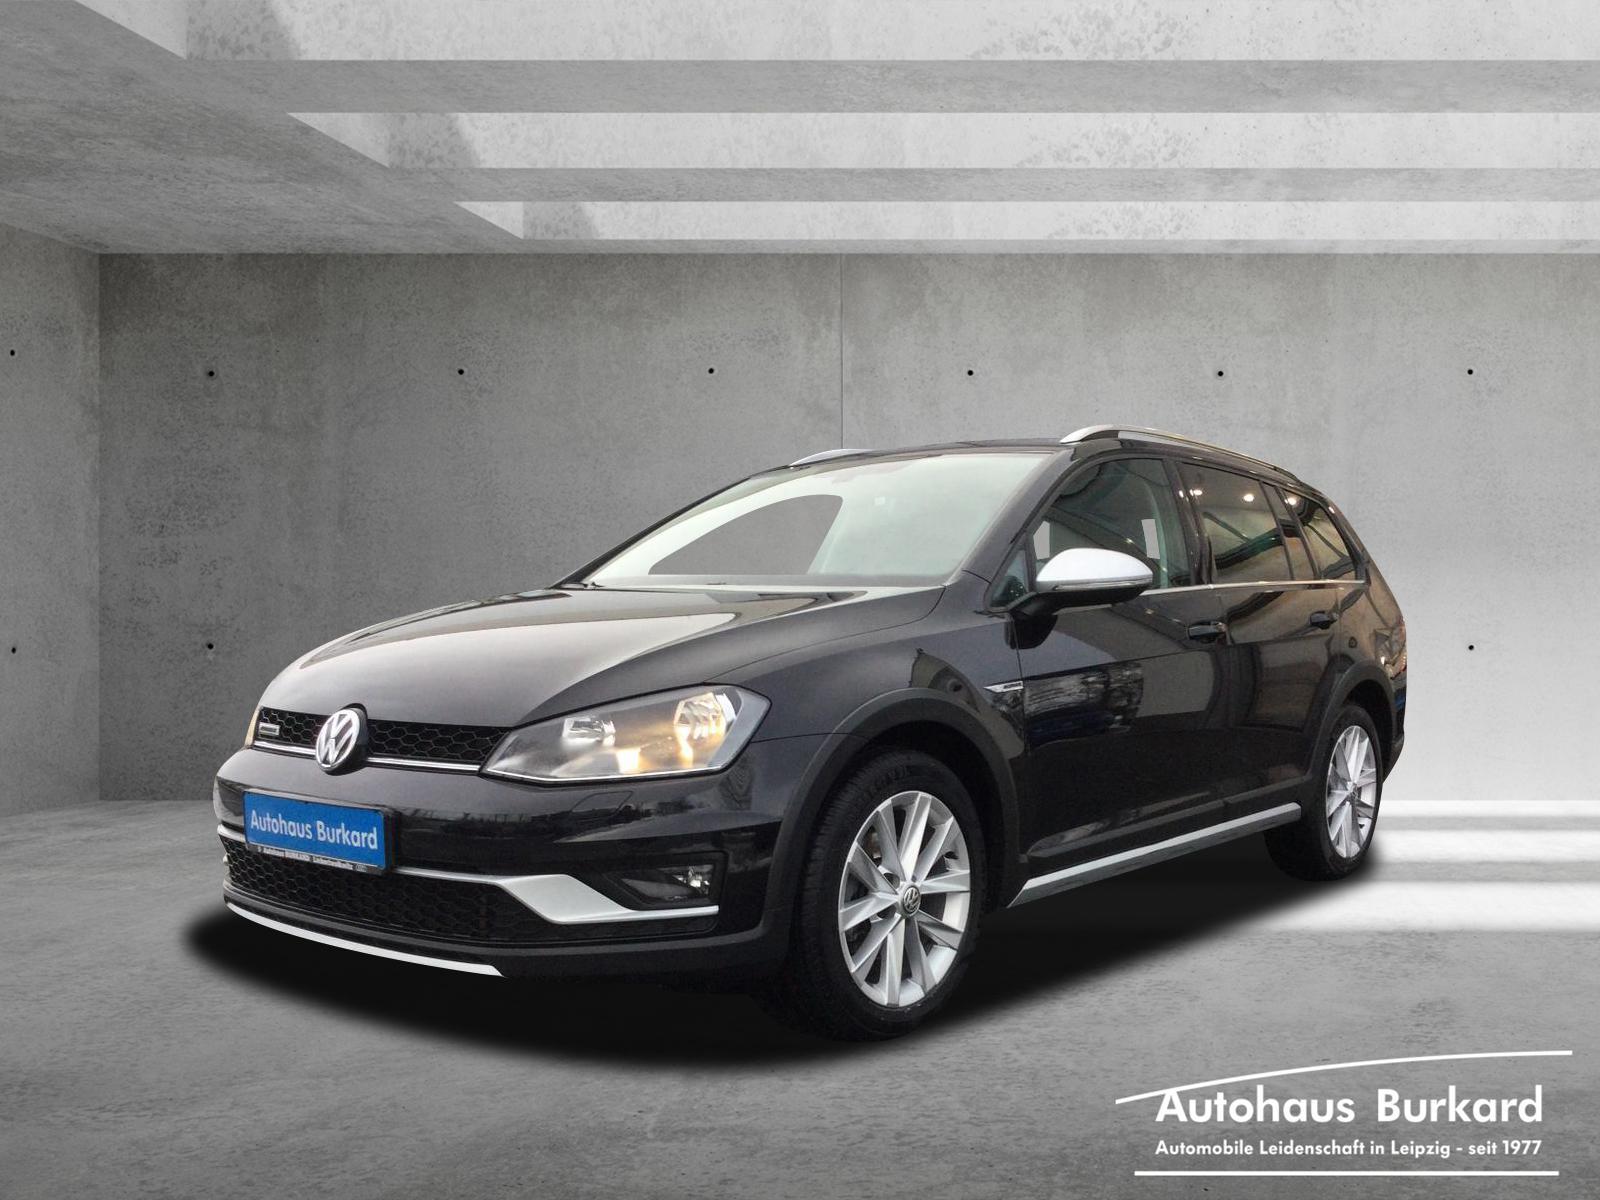 Volkswagen Golf VII Alltrack 2.0l TDI 150 PS 4Motion | Navi, Jahr 2016, Diesel